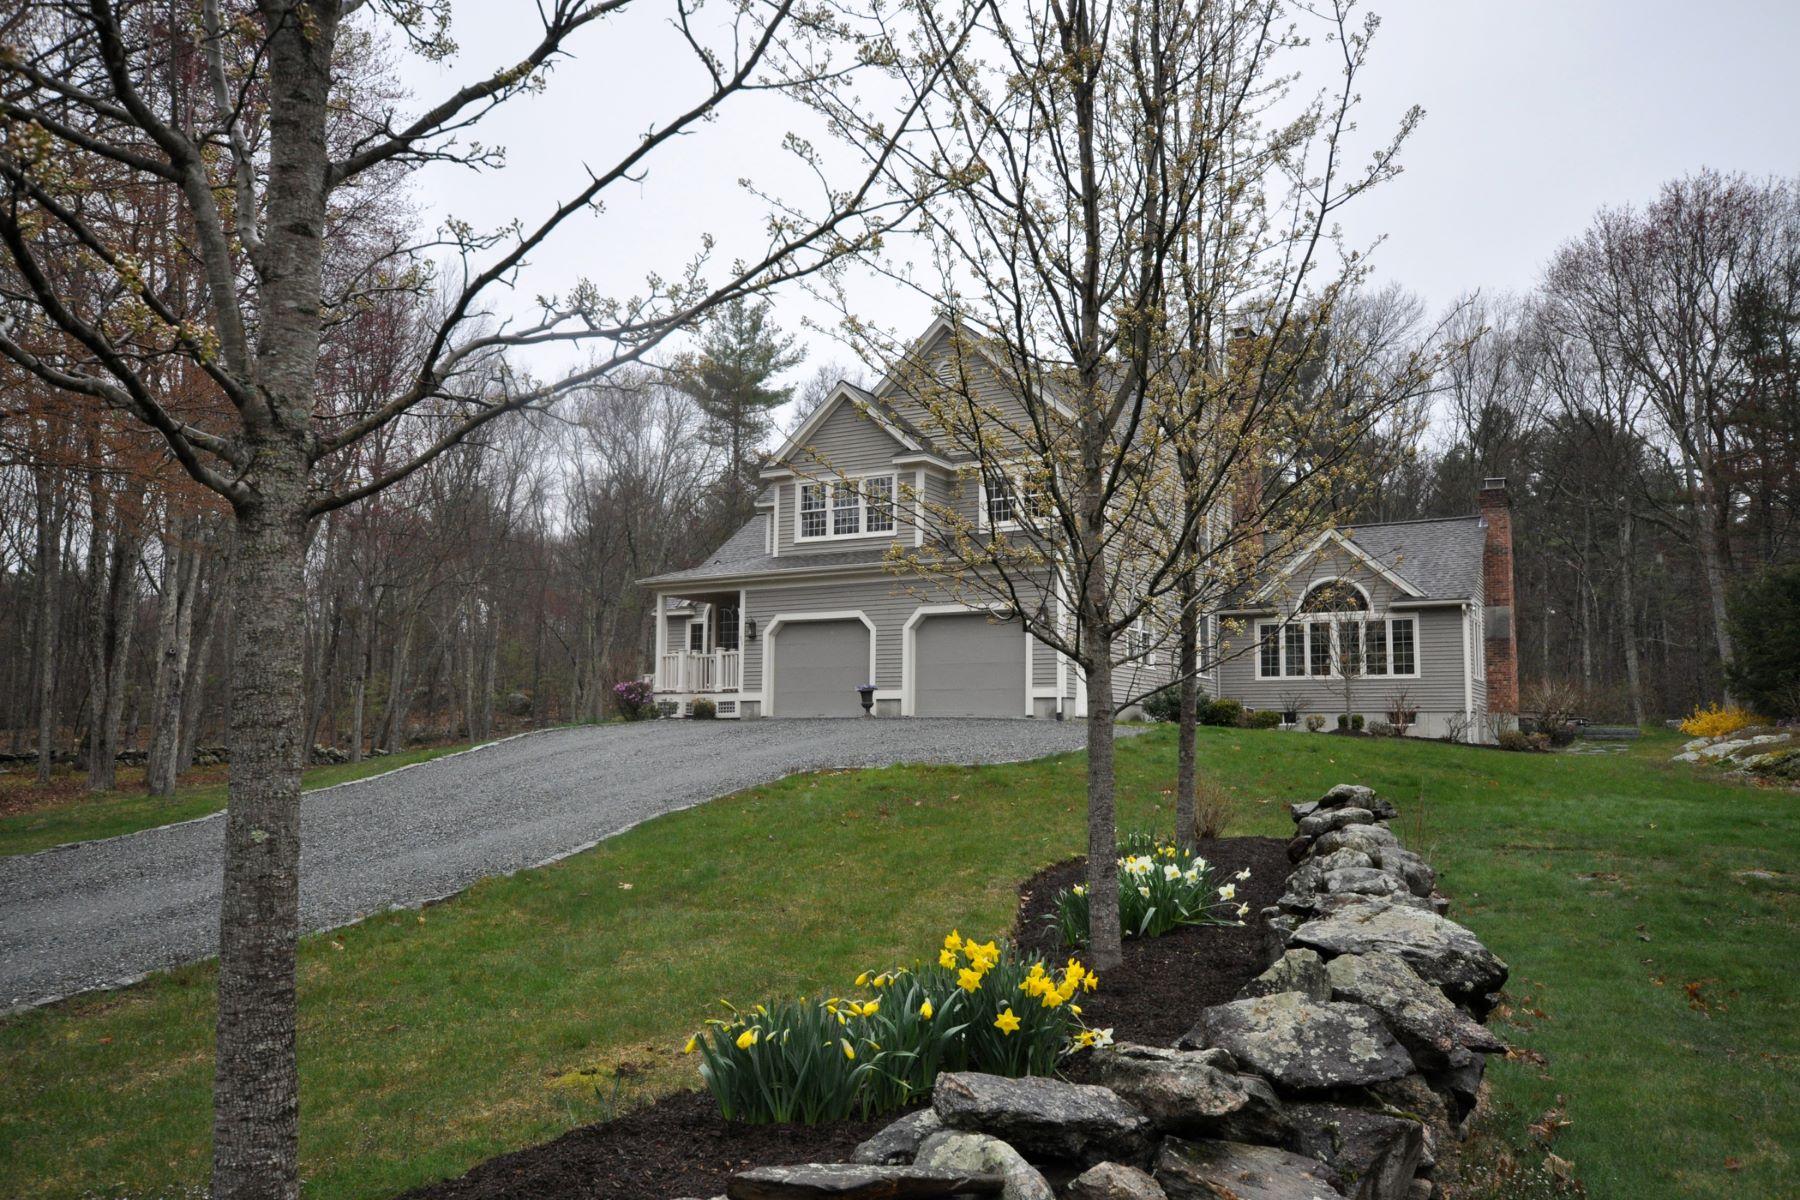 Single Family Homes for Sale at 51 Westcott Rd Harvard, Massachusetts 01451 United States